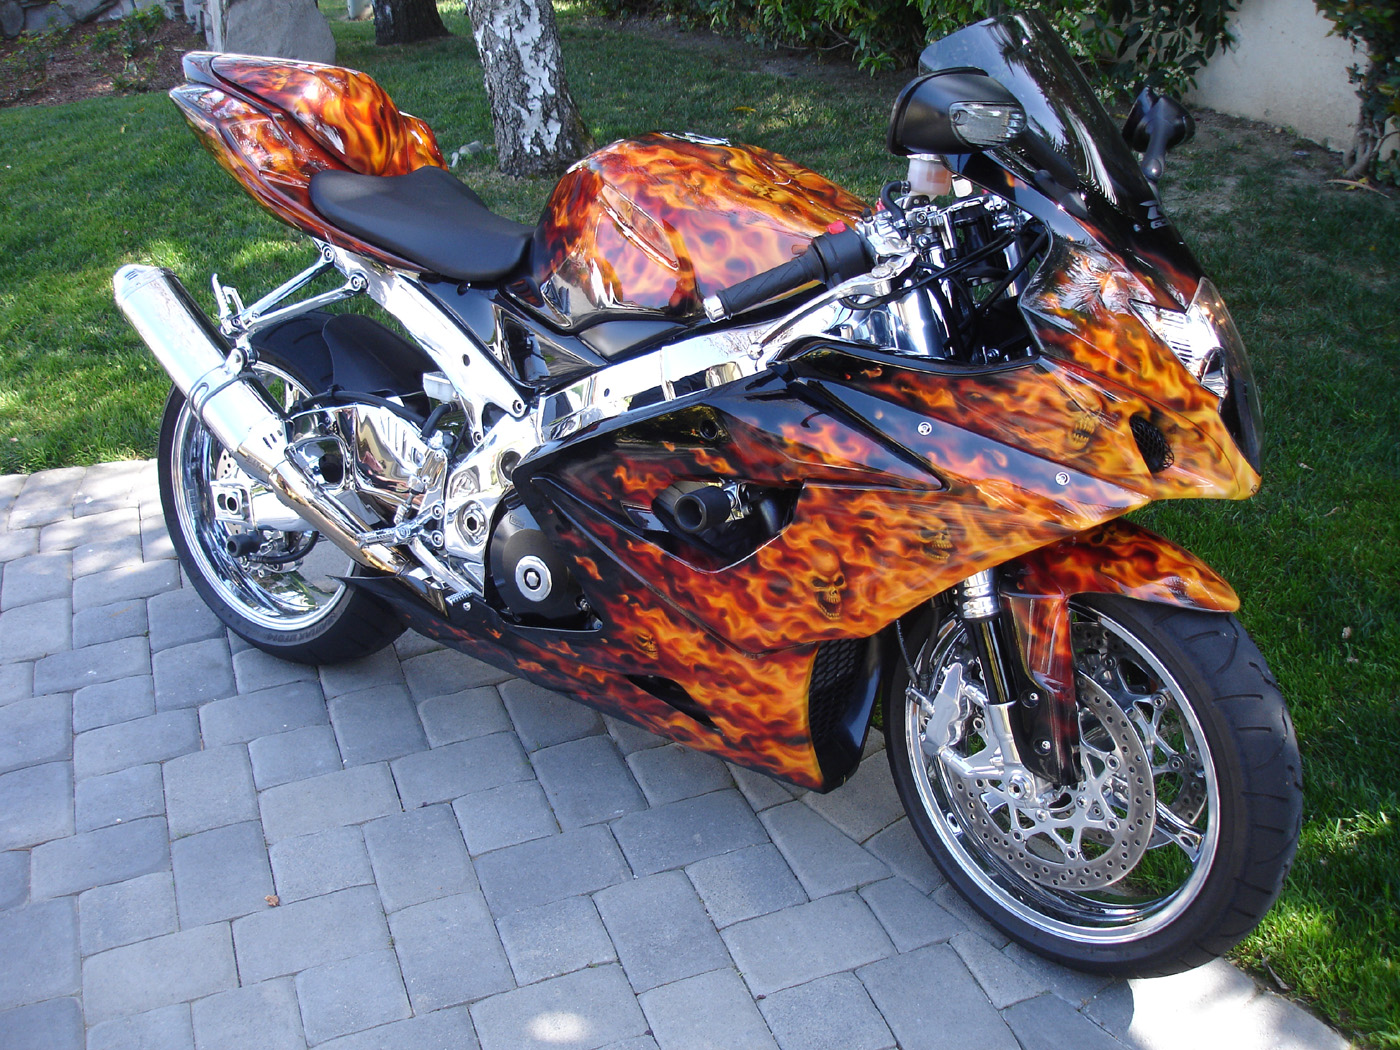 custom motorcycles motorcycle bikes choppers bike cycles sport customized paint speedy steel sportbikes wheels 1000 1050 1400 kb gsxr rocket